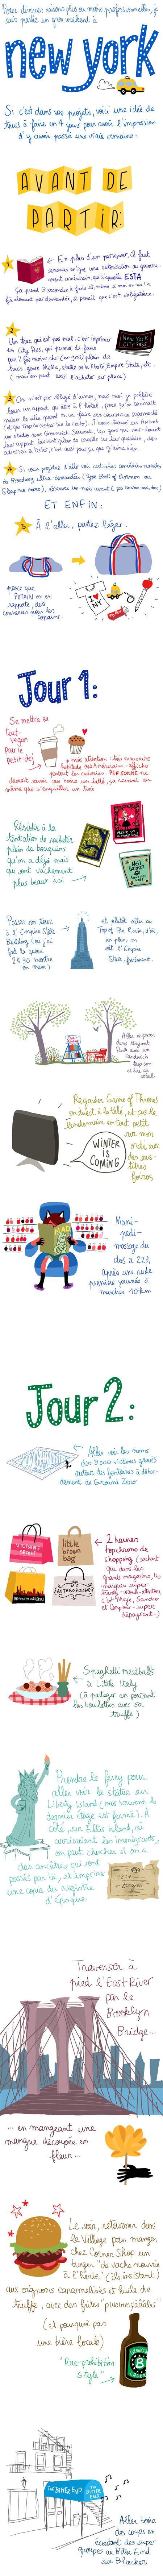 (D) New York par la talentueuse dessinatrice Pénélope Bagieu http://www.penelope-jolicoeur.com #UneSource